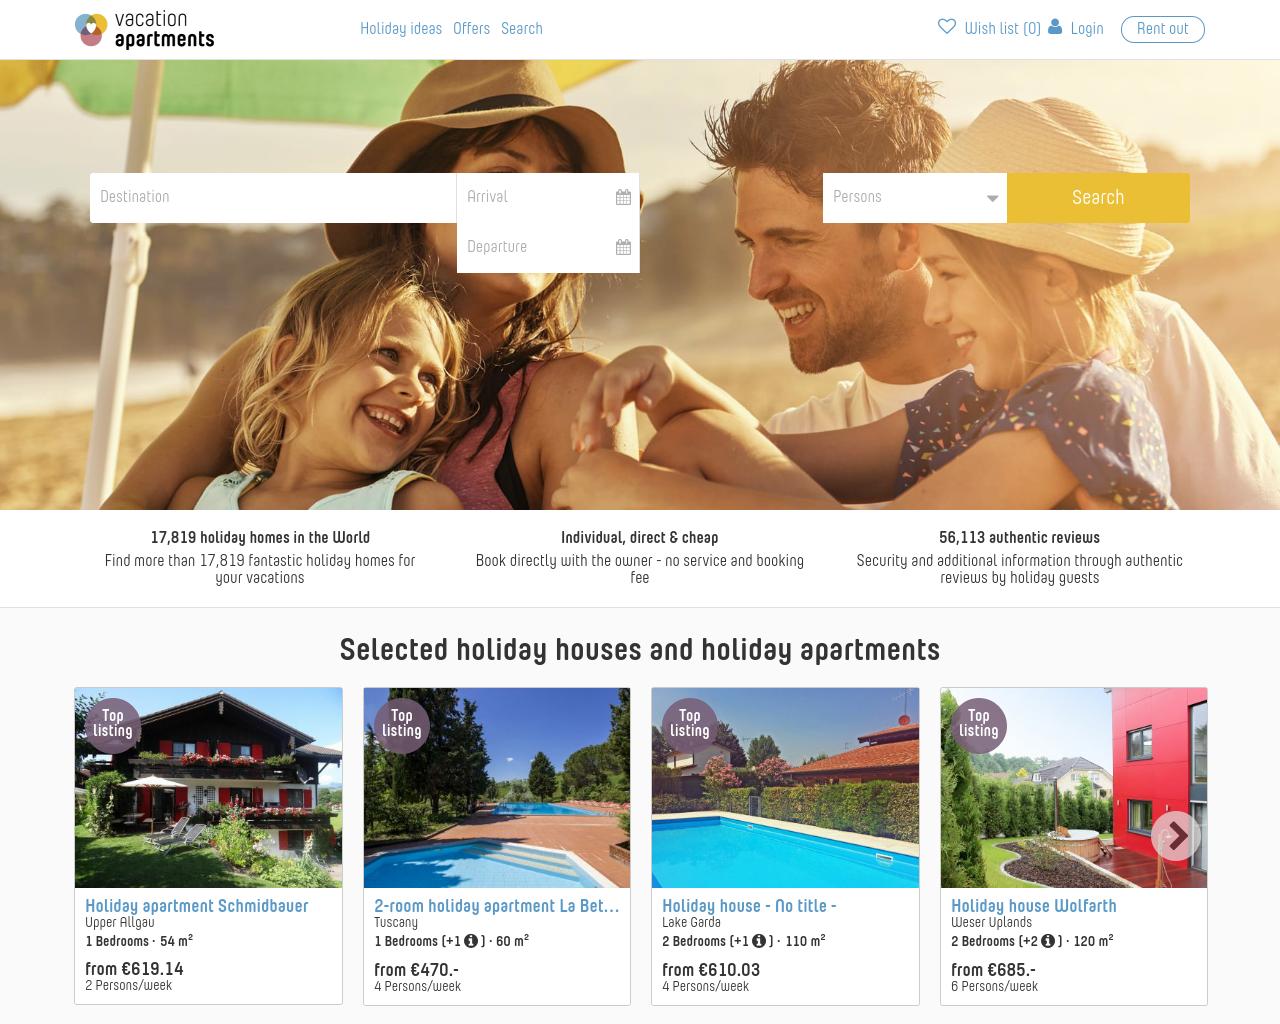 Vacation-Apartments-Advertising-Reviews-Pricing